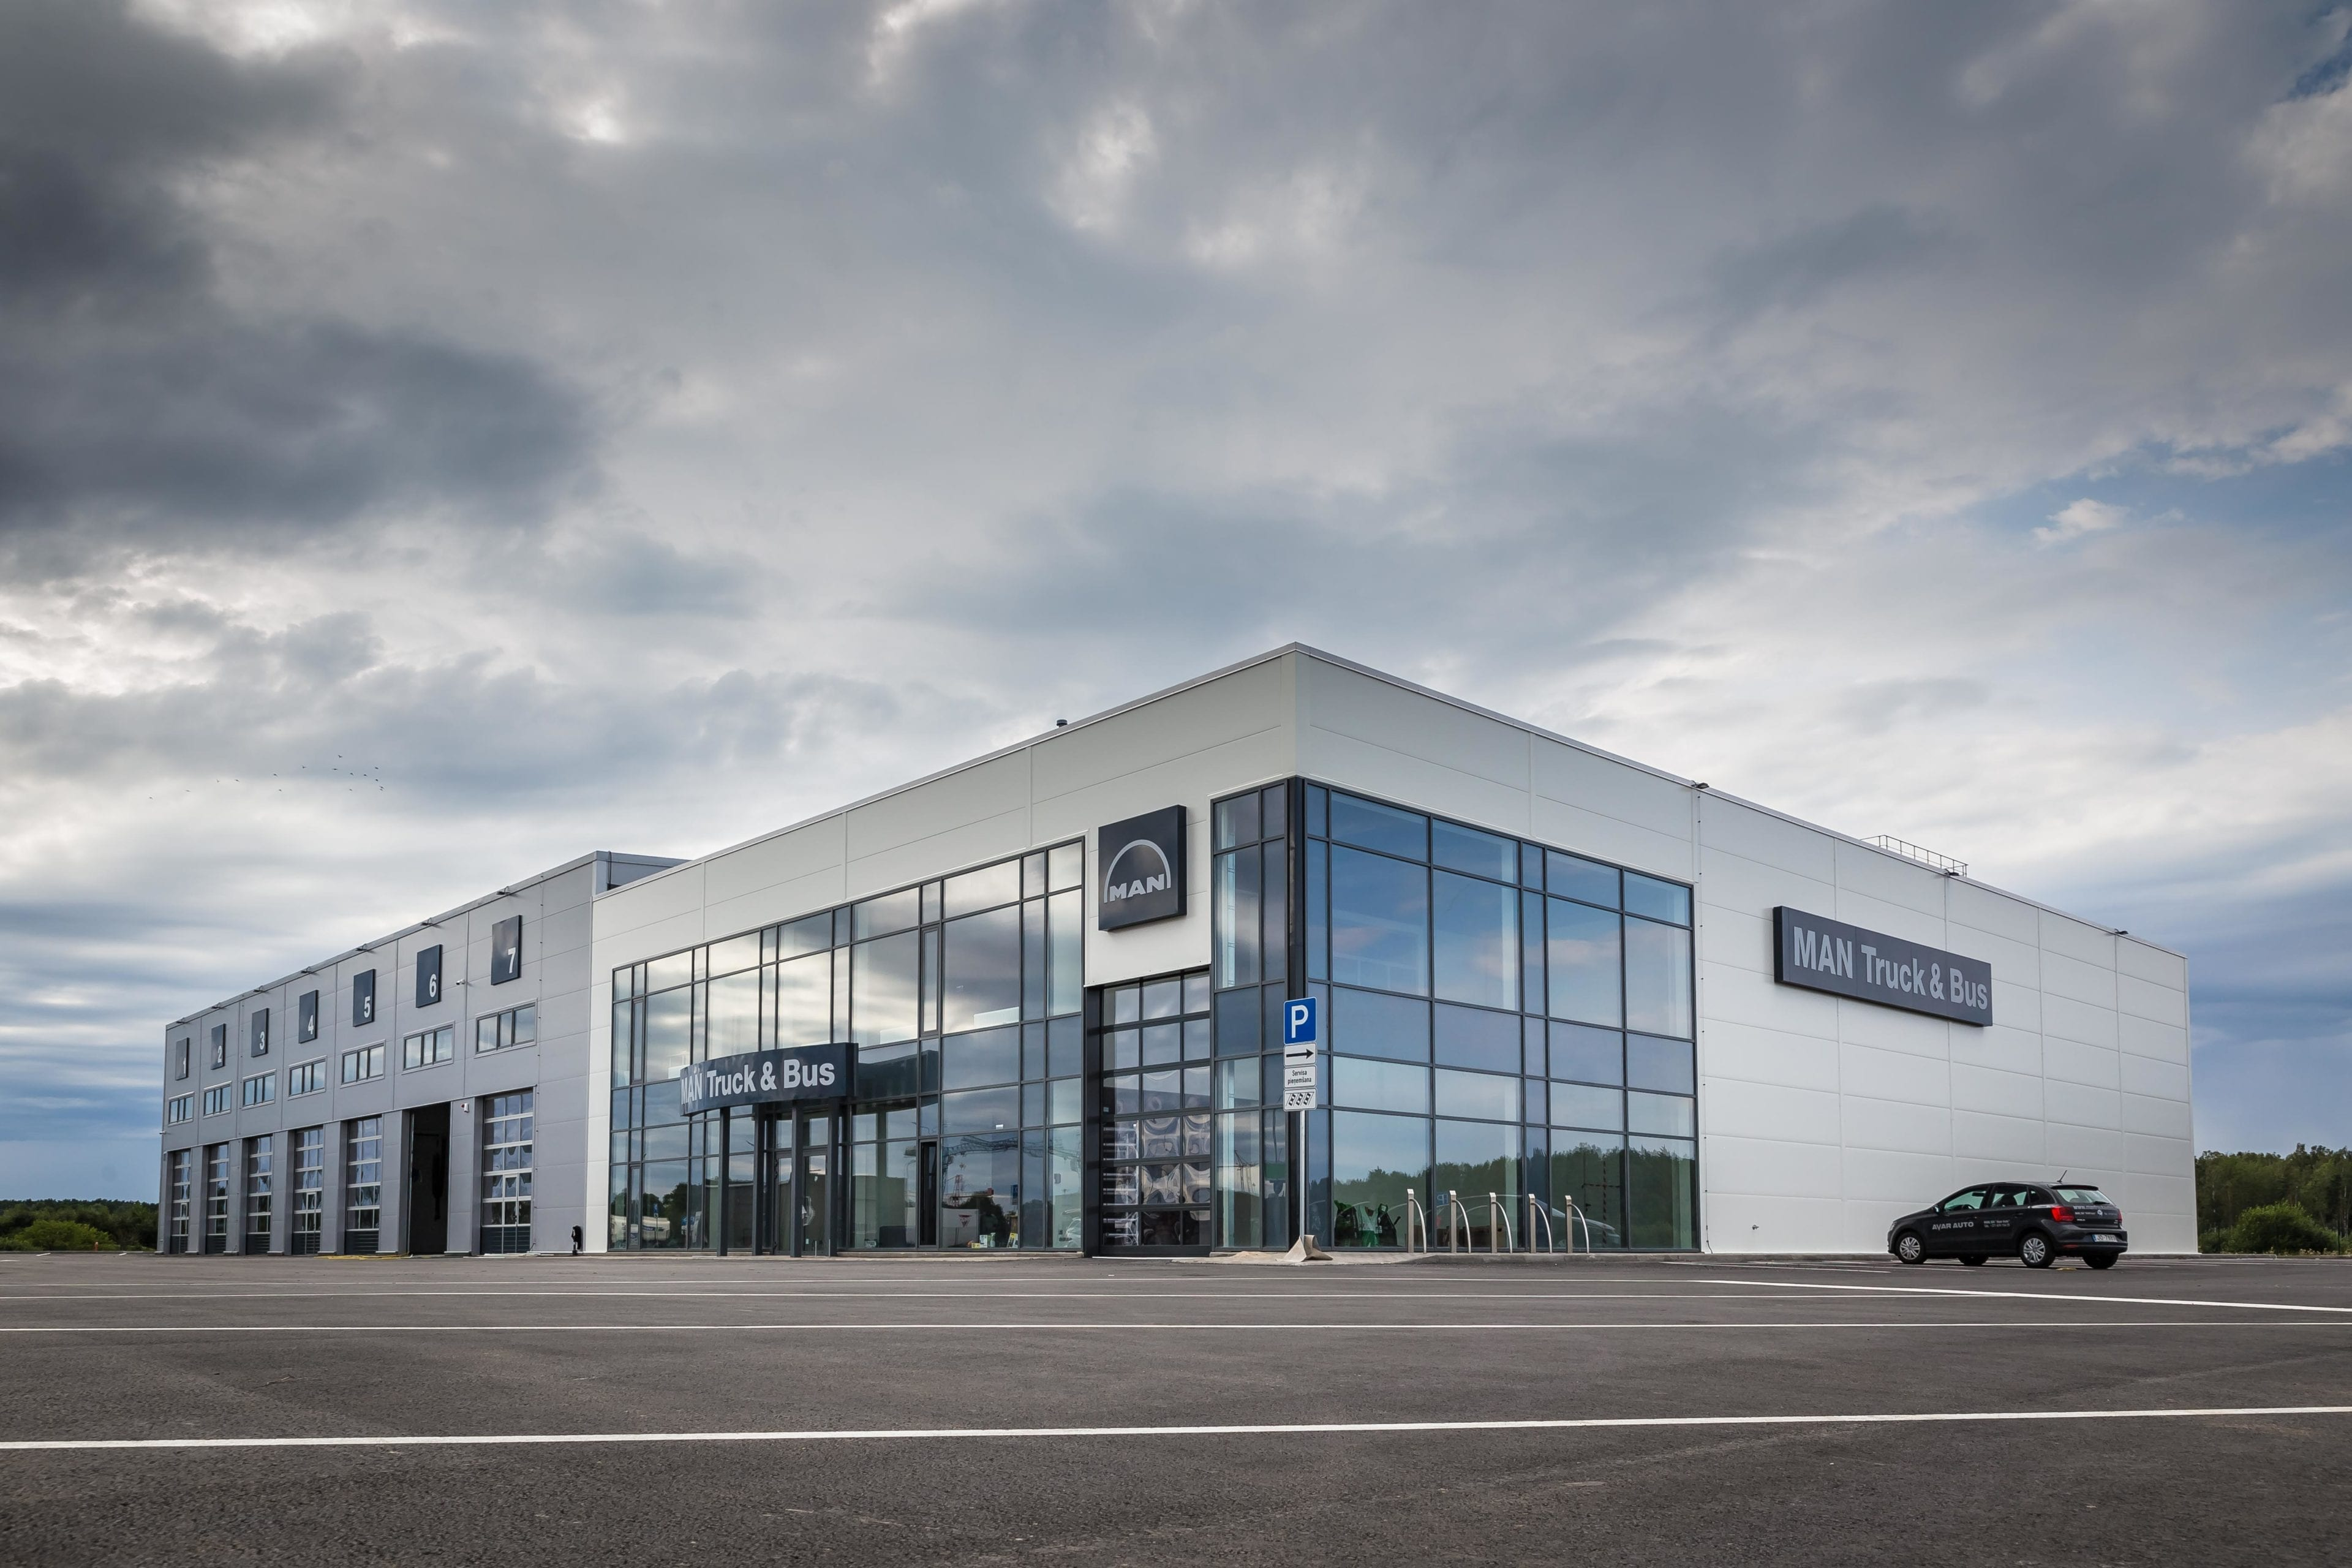 Avar Auto Service Centre receives the Latvian Construction Industry's Annual Award 2017